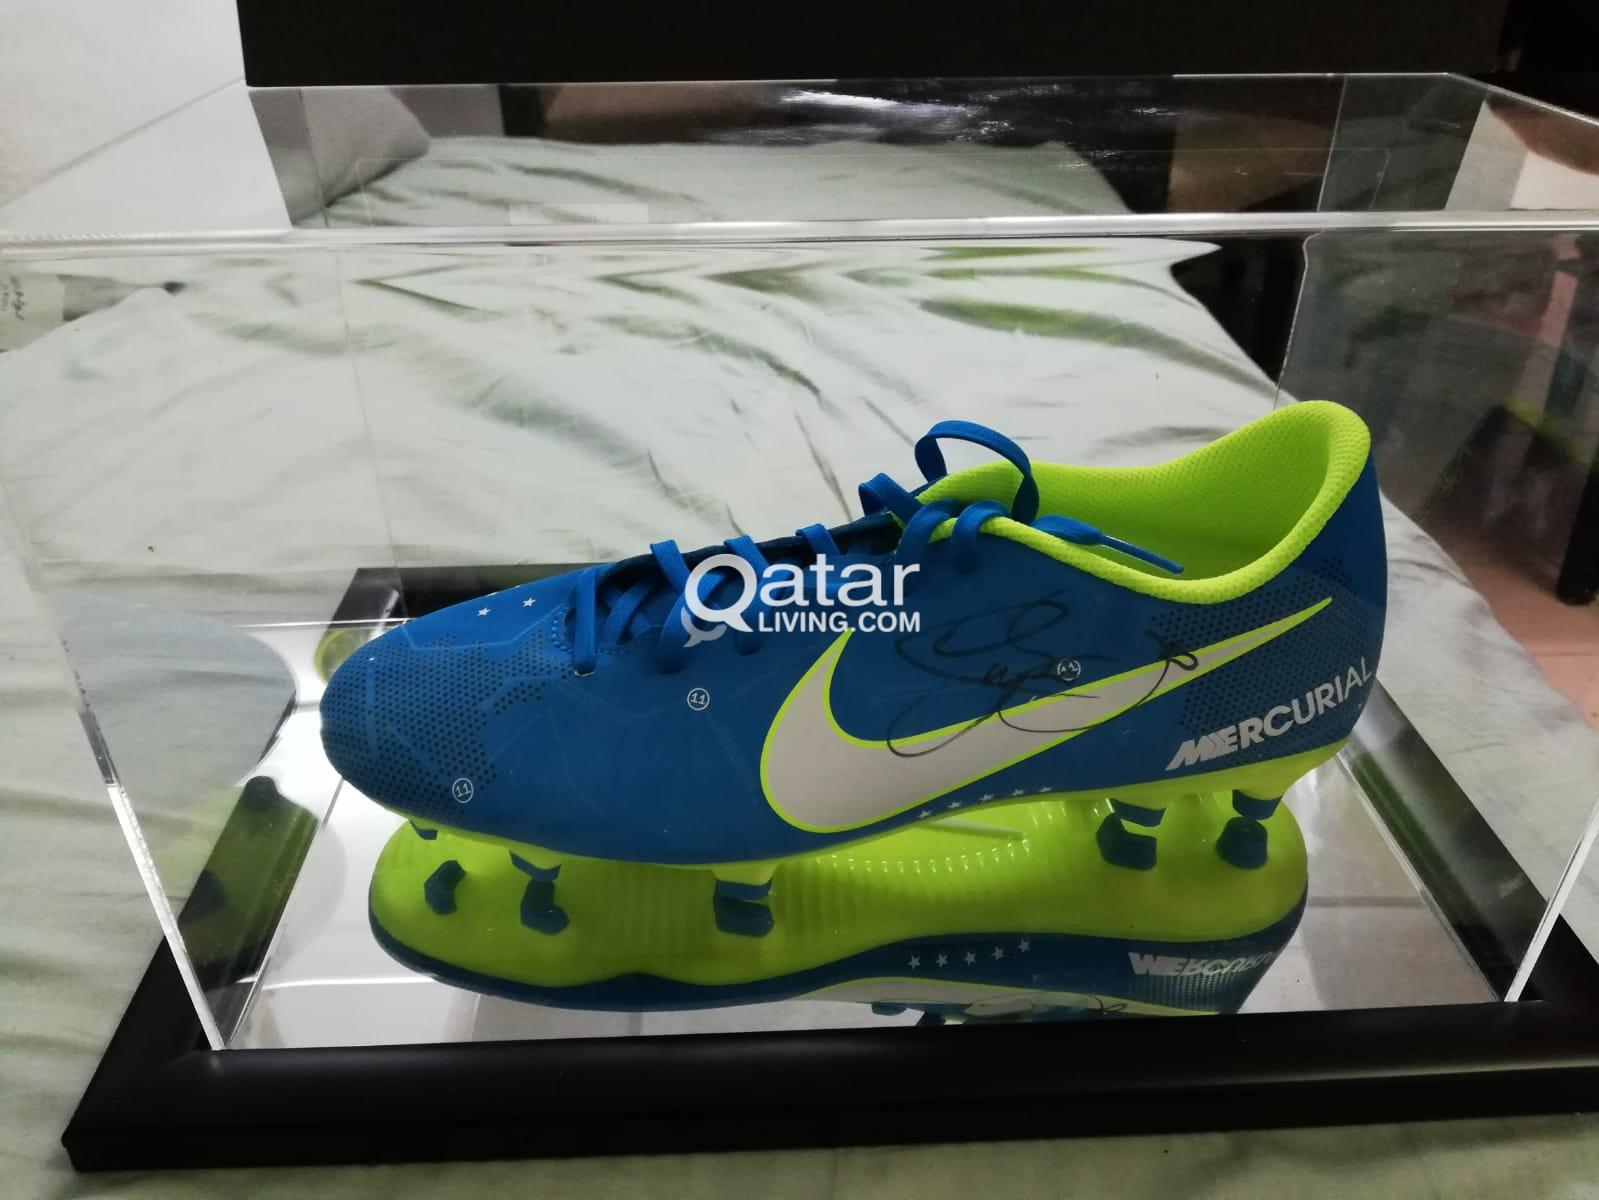 16010662313a0 title  title  title  title  title  title  title  title. Information. Neymar  Signed Blue Nike Boot ...